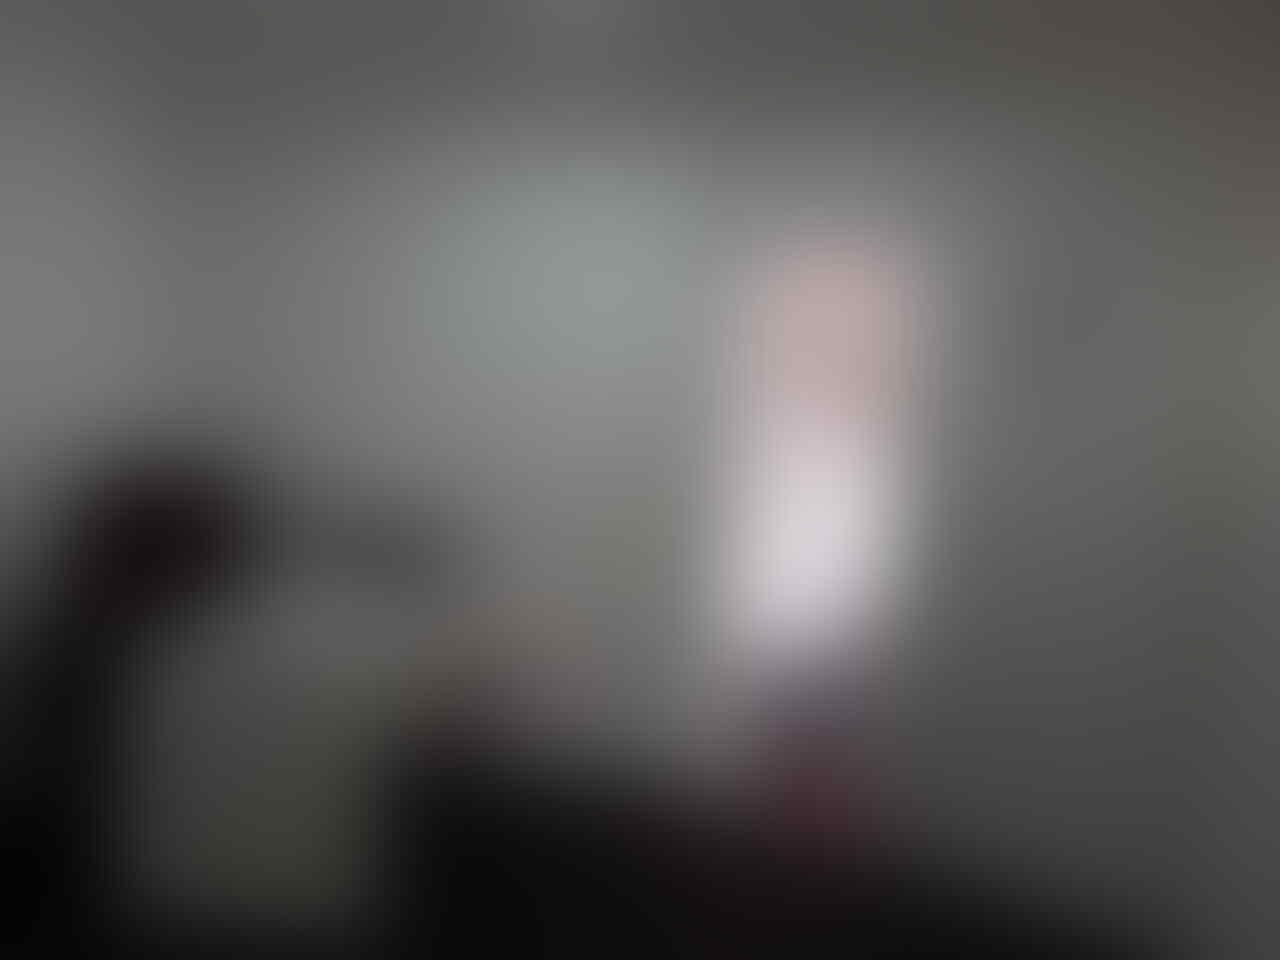 Pasang Kaca Cermin 5mm Frameless Custom x 90 100 120 150 180 200 300